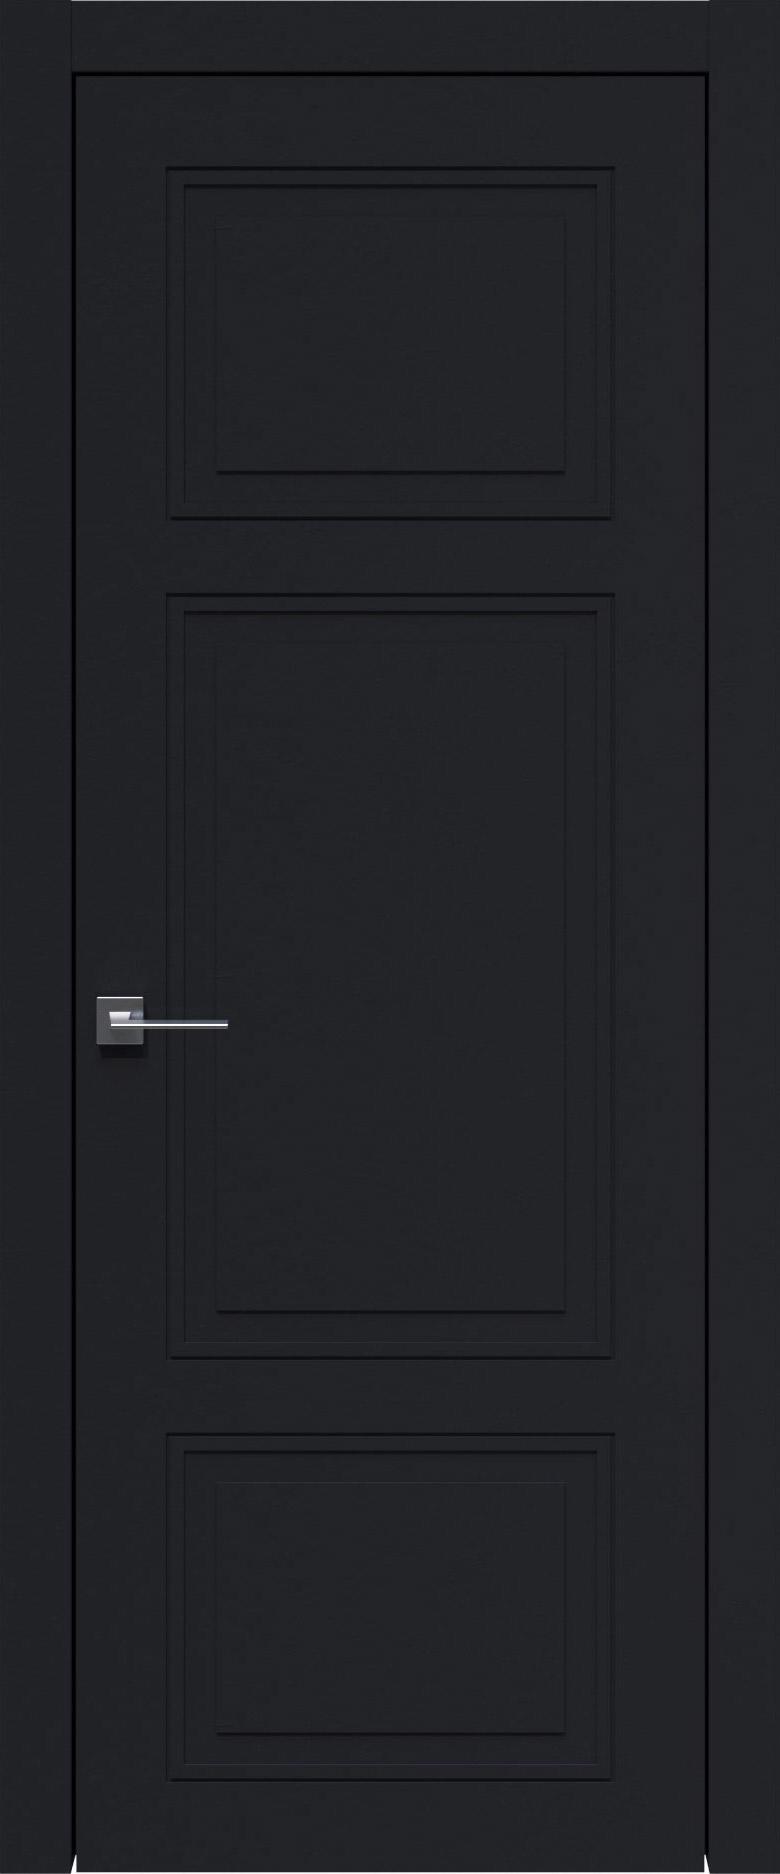 Siena Neo Classic цвет - Черная эмаль (RAL 9004) Без стекла (ДГ)